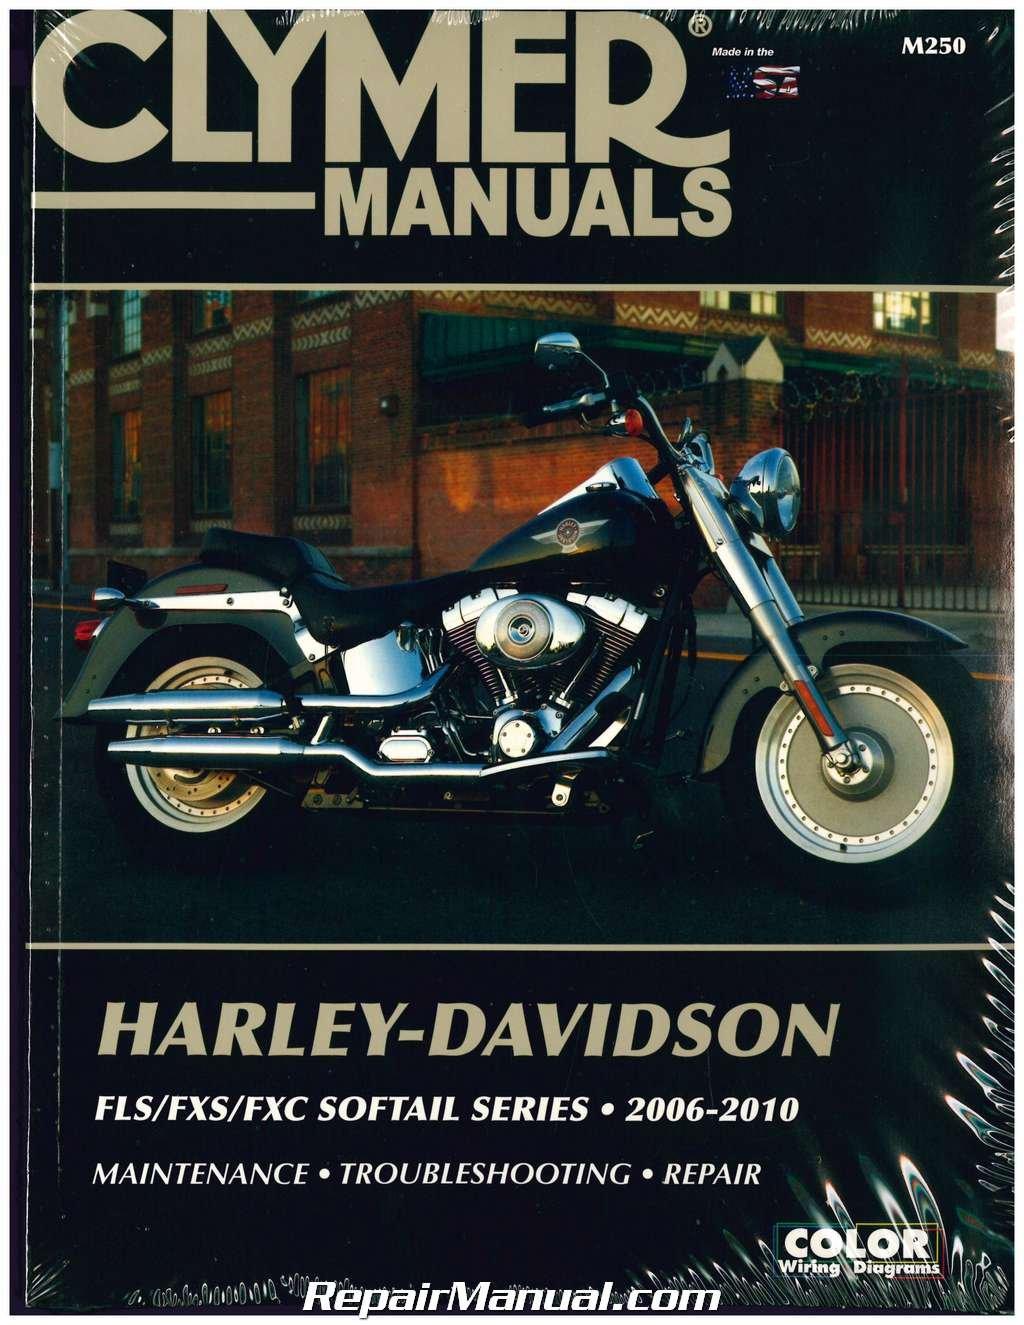 M250 Harley Davidson Softail Motorcycle Manual 2006-2010 Clymer:  Manufacturer: Amazon.com: Books